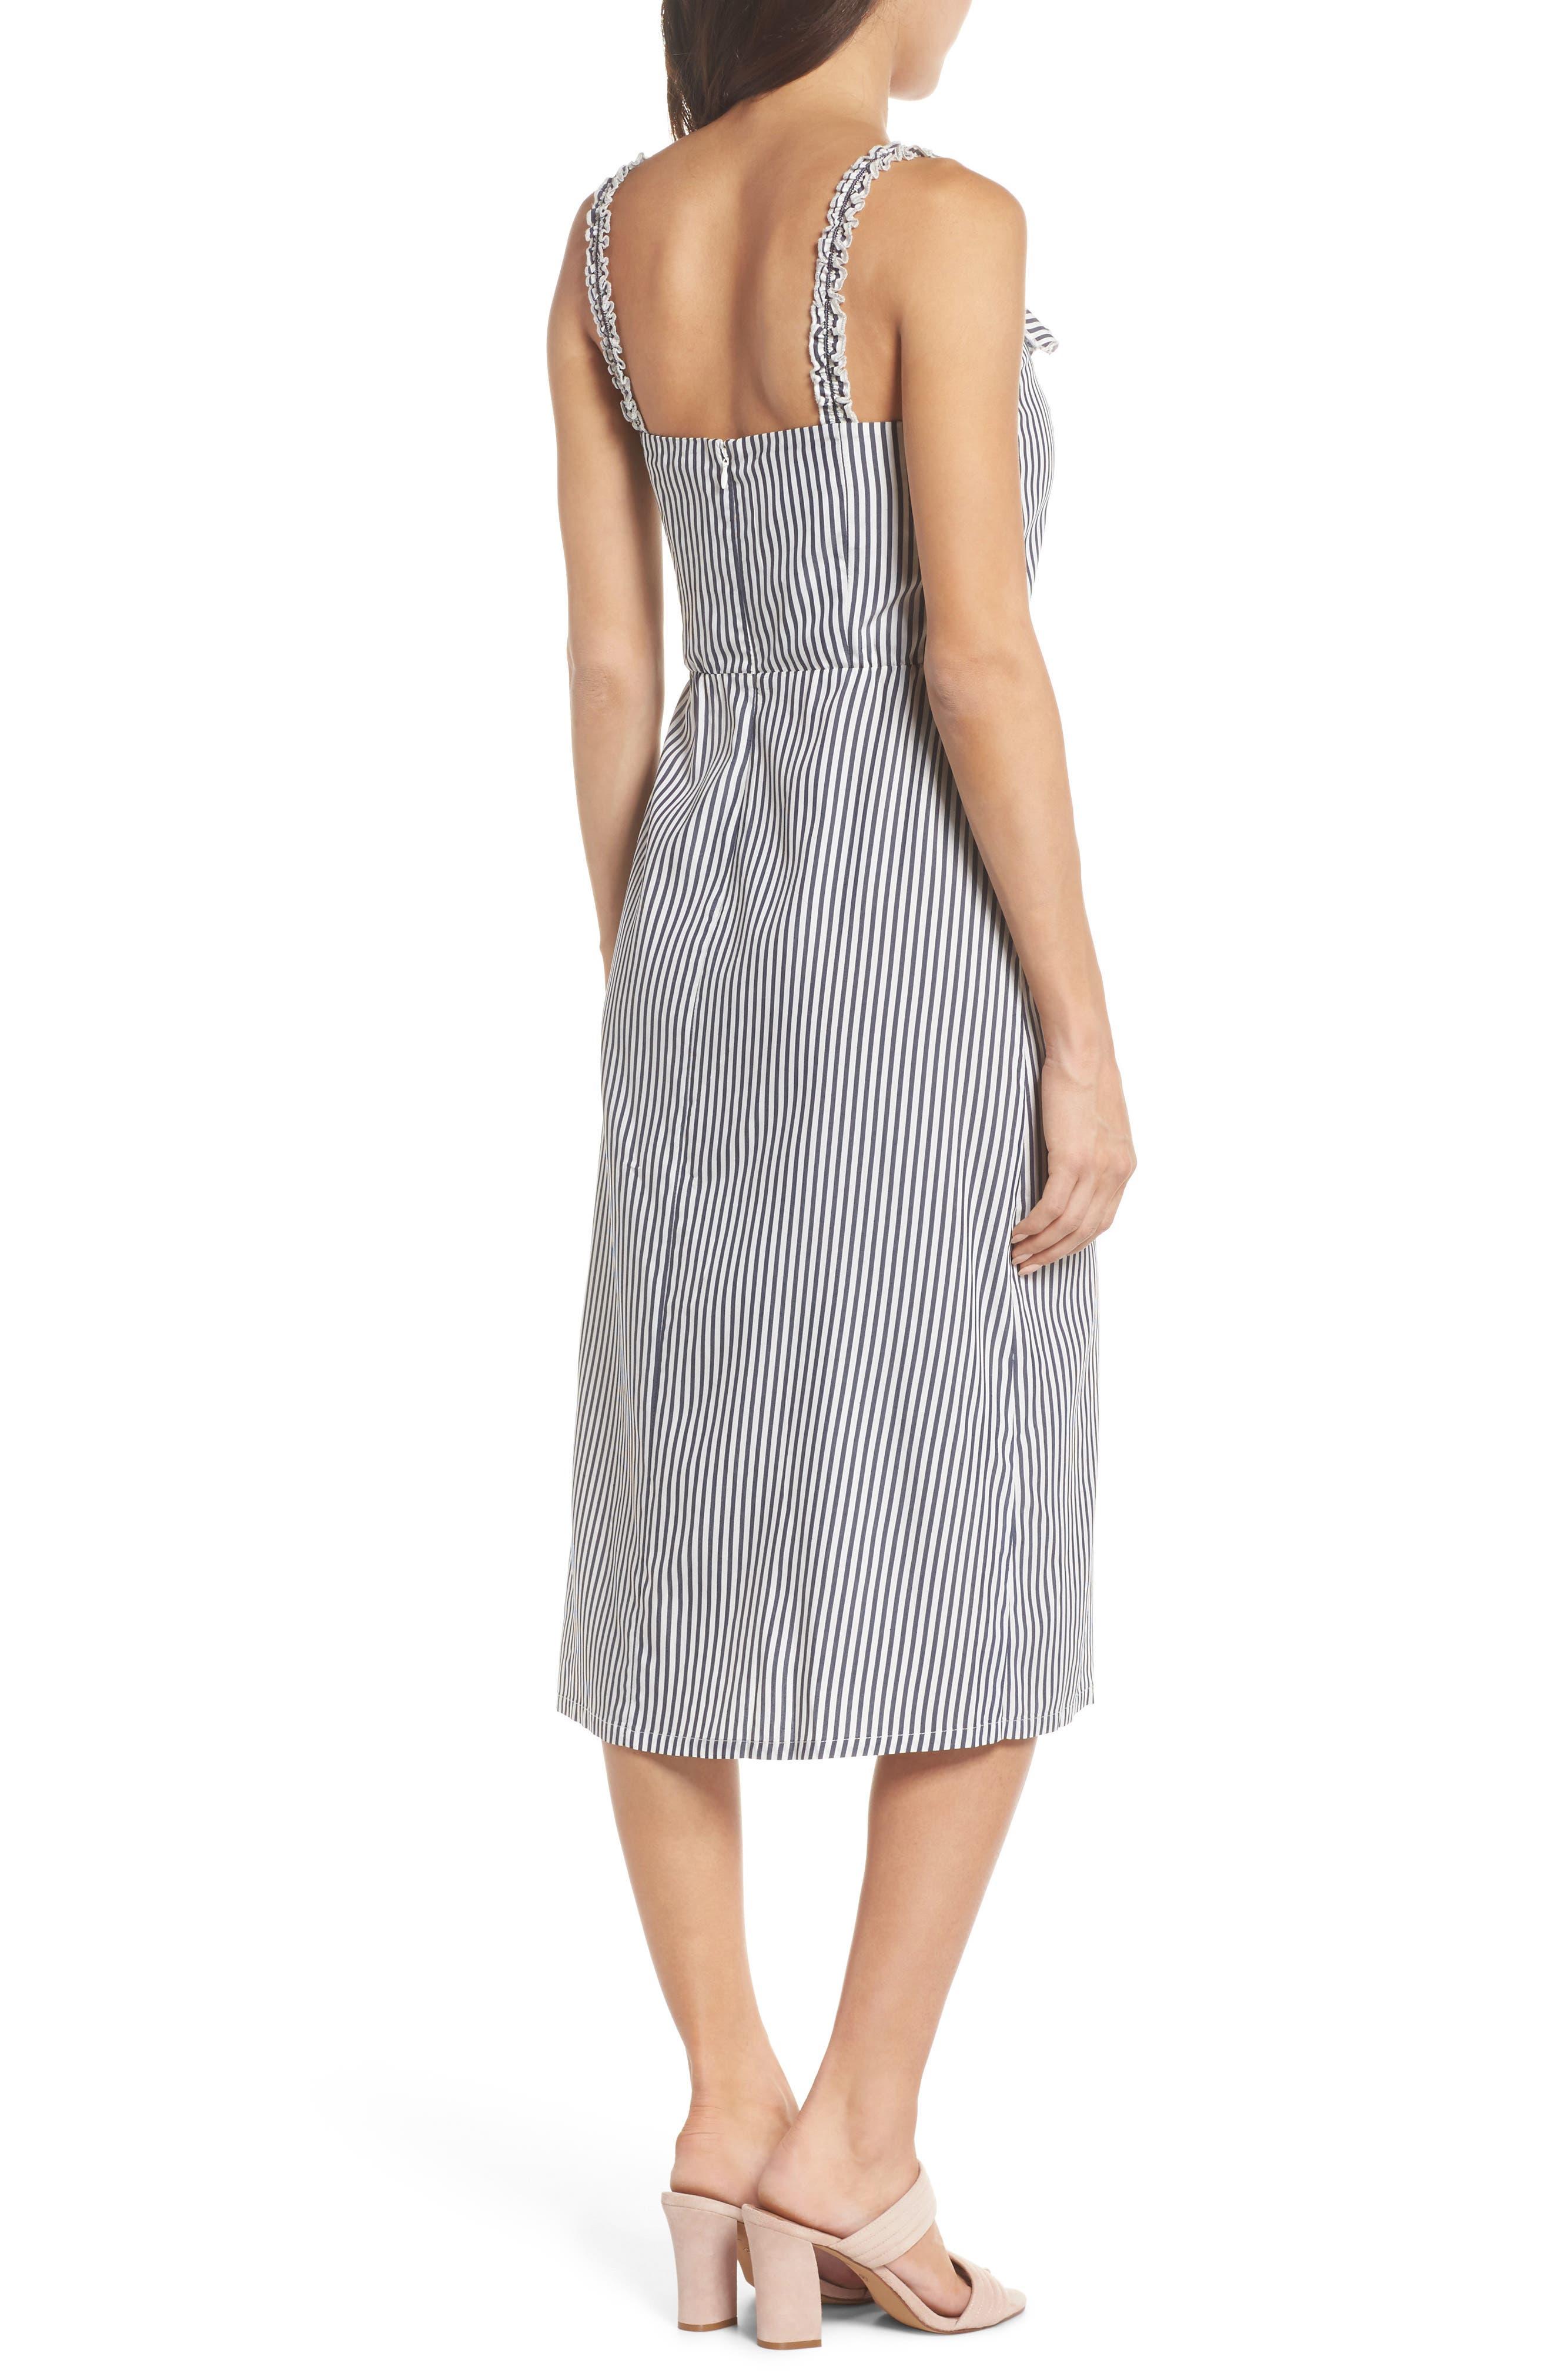 Drinks On Me Stripe Ruffle Midi Dress,                             Alternate thumbnail 2, color,                             Navy/ White Mini Stripe